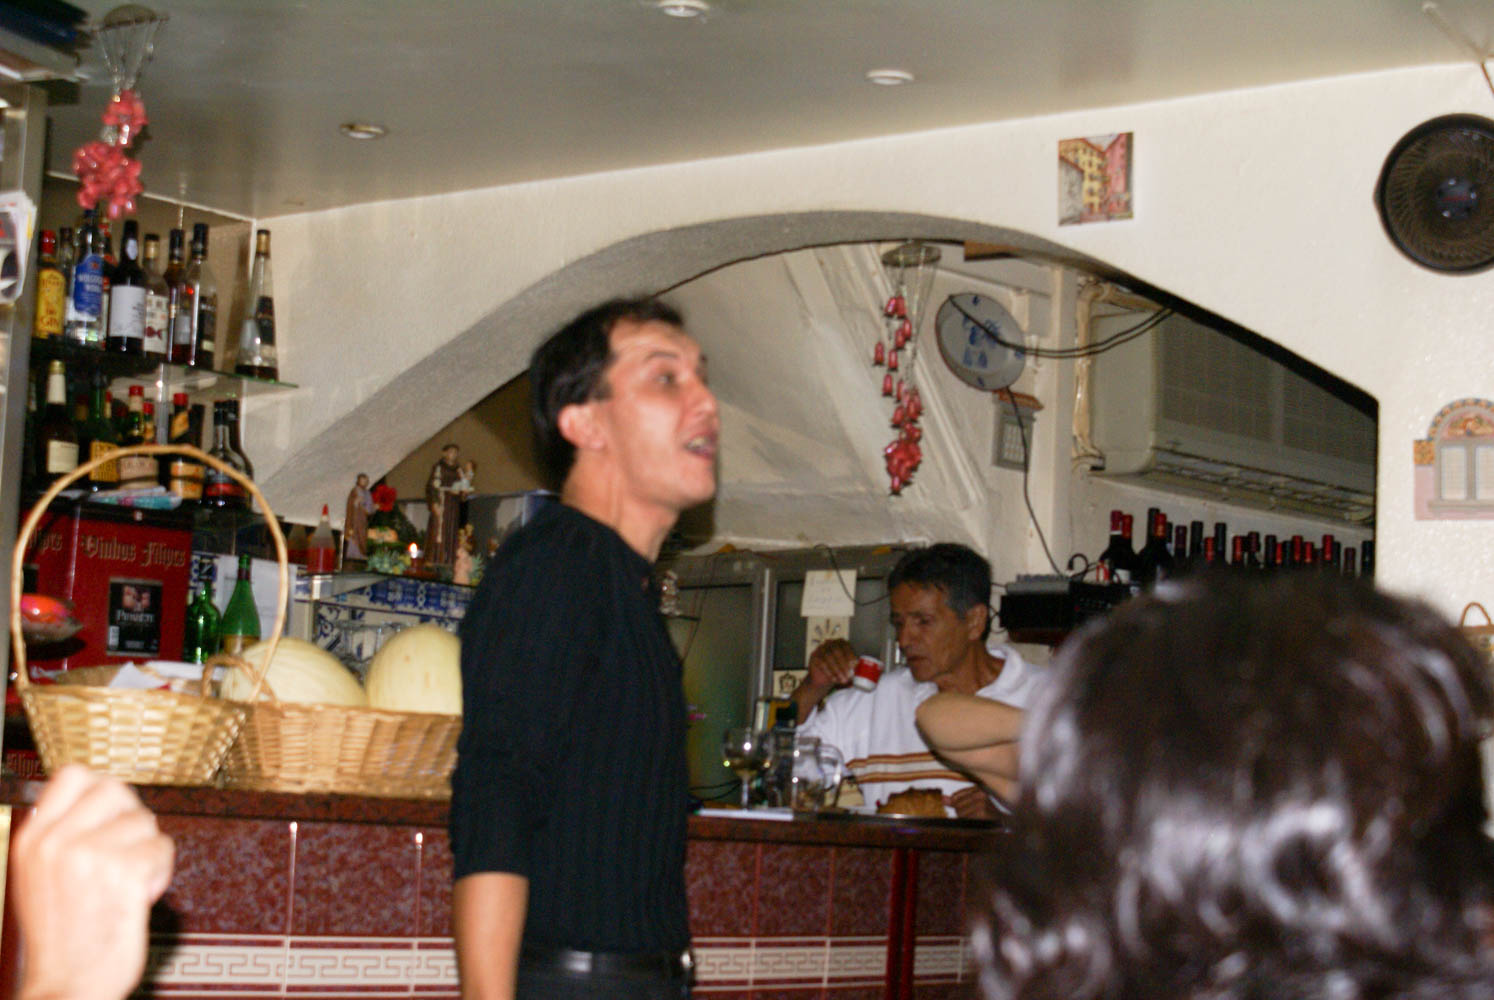 Even the waiters participate